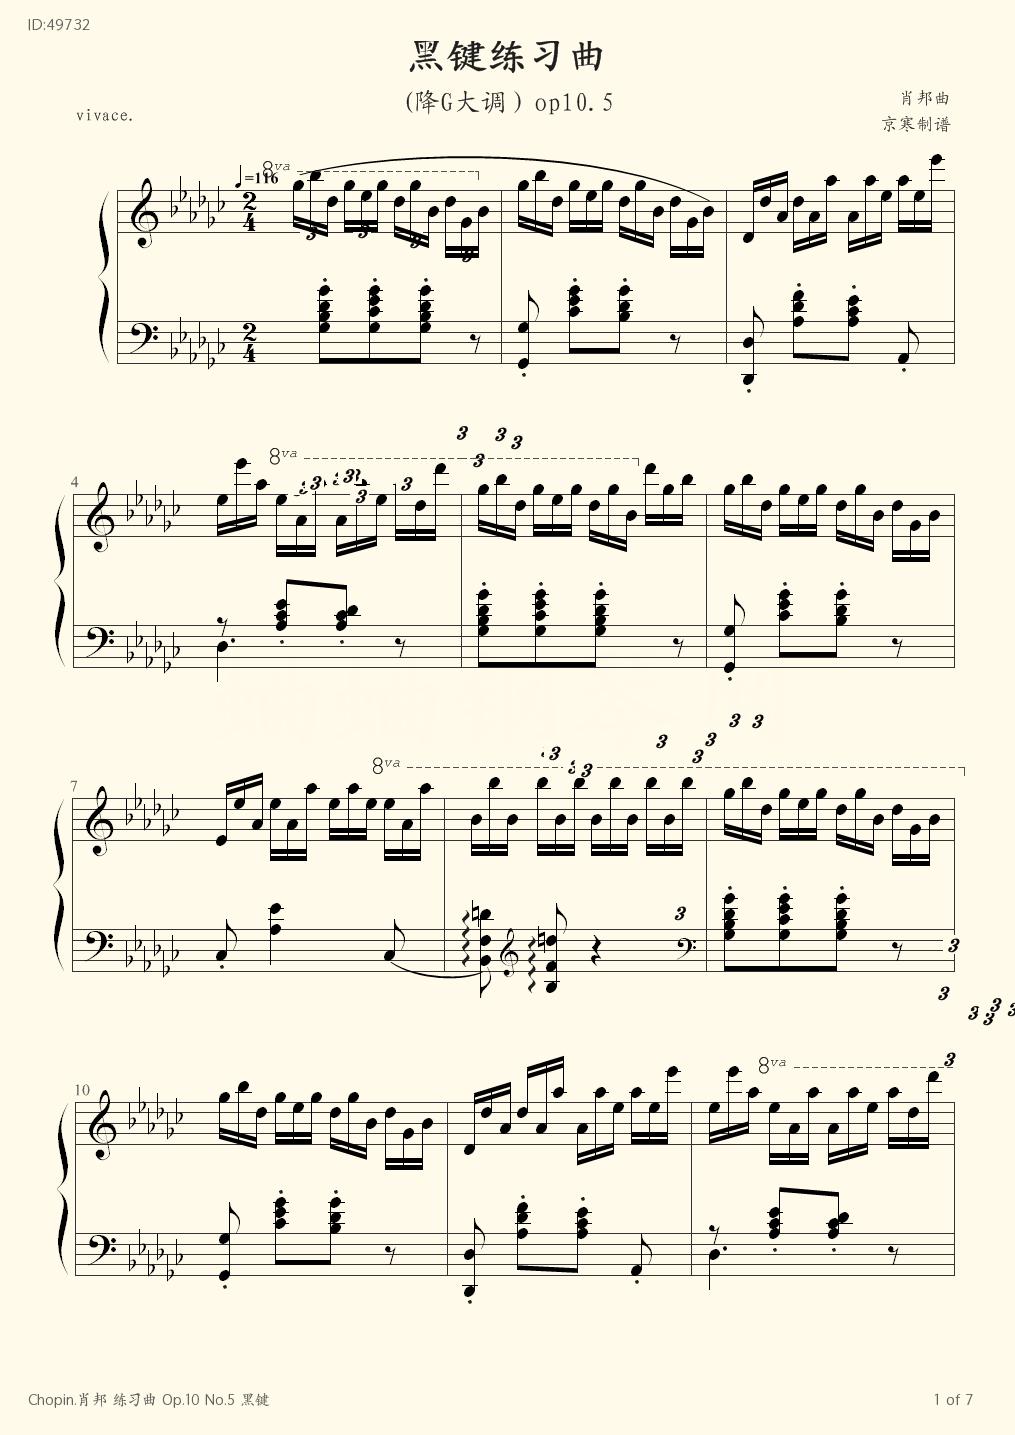 Chopin Op 10 No 5  -  chopin - first page